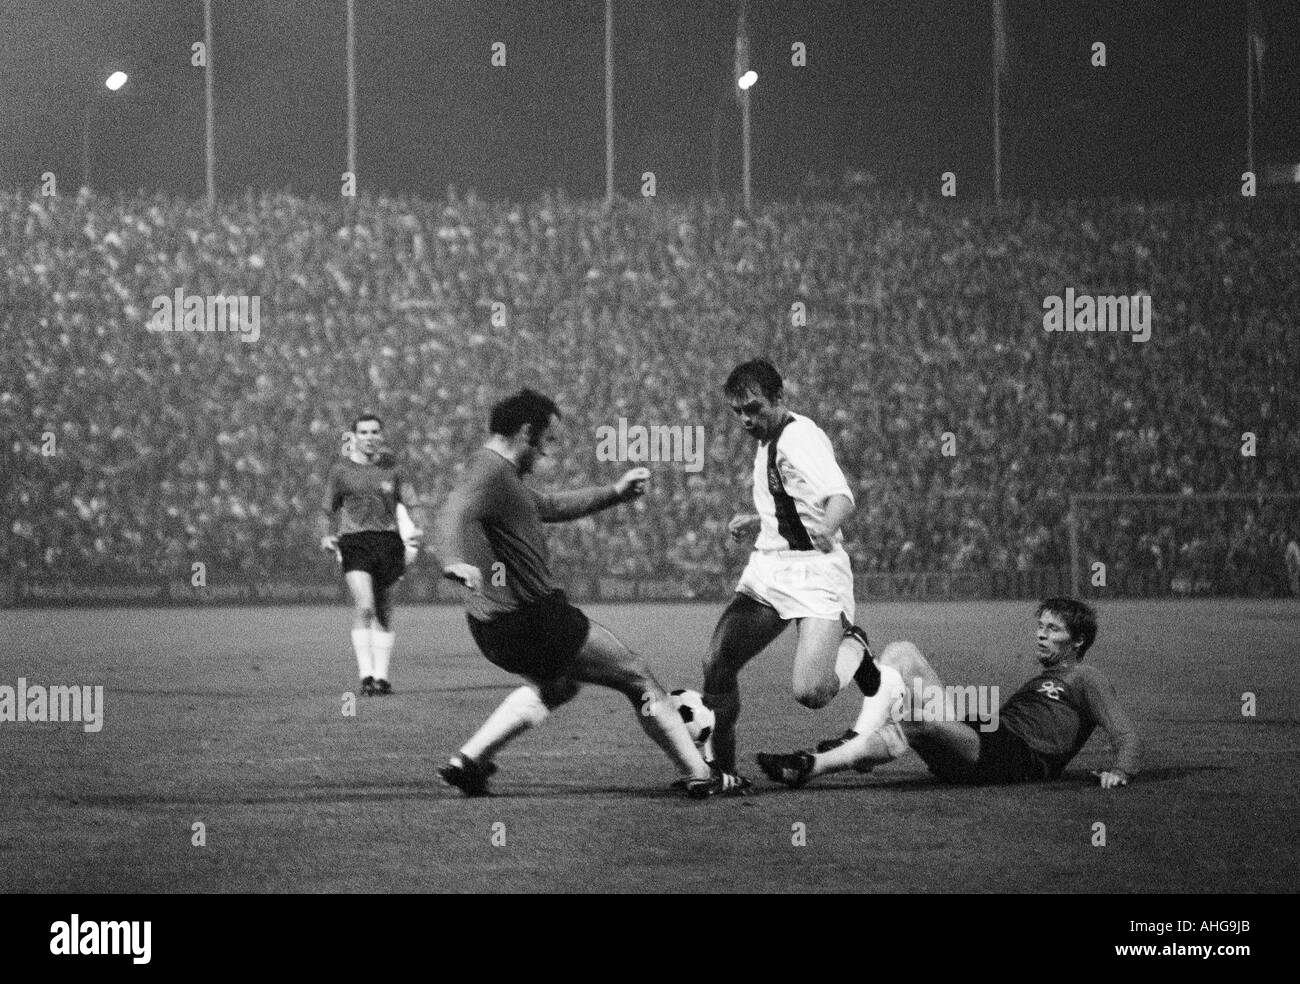 football, Bundesliga, 1970/1971, Borussia Moenchengladbach versus Hanover 96 0:0, Boekelberg Stadium, scene of the match, f.l.t.r. Claus Brune, Klaus Bohnsack (both 96), Herbert Laumen (MG), Hans Josef Hellingrath (96) - Stock Image